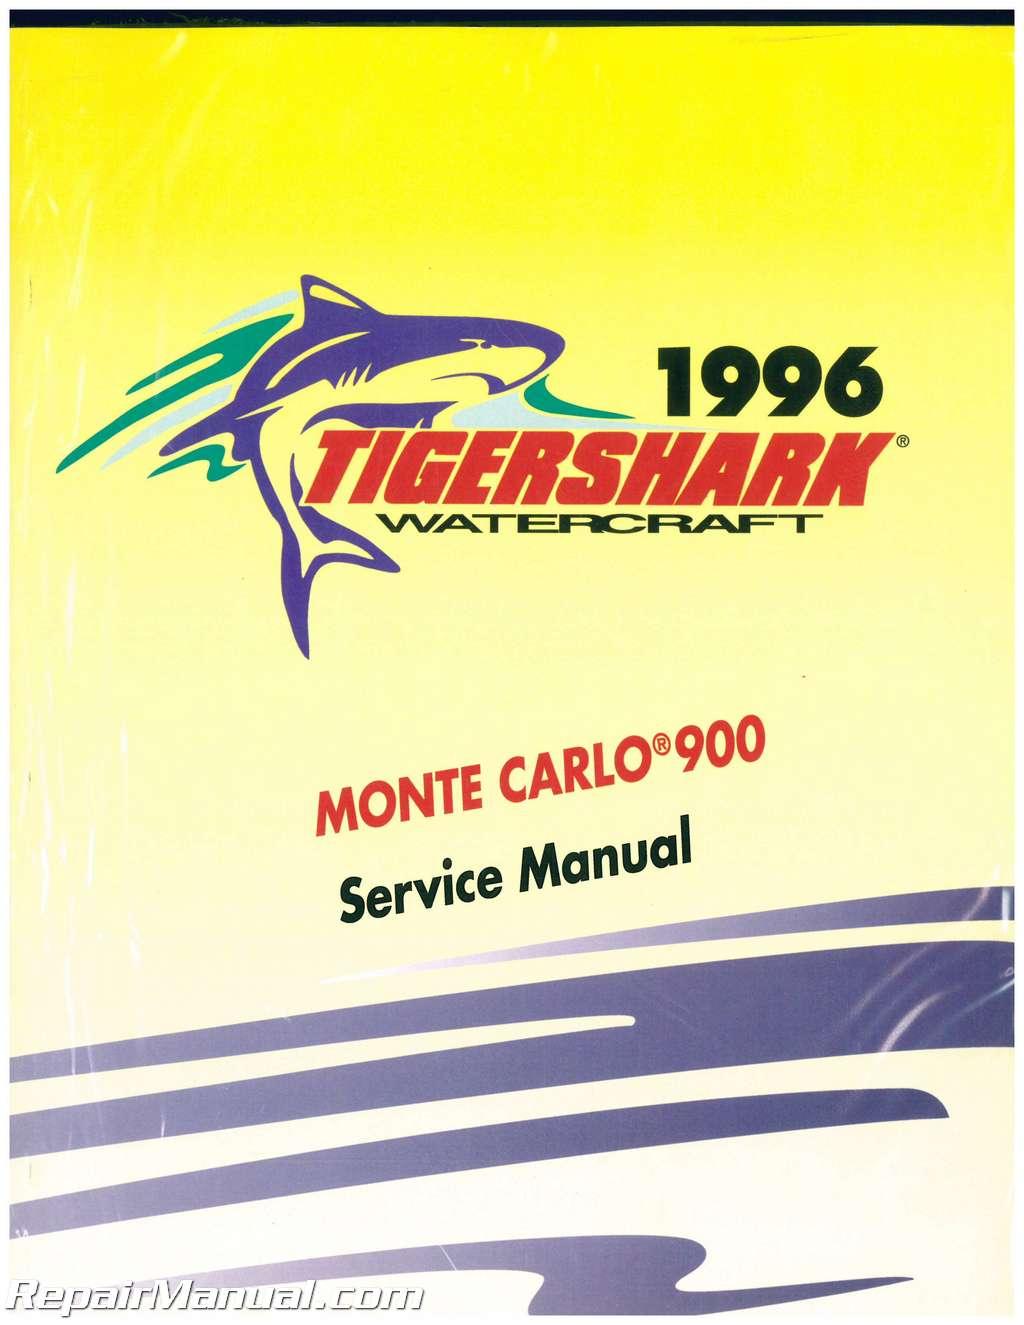 1996 tigershark monte carlo 900 personal watercraft service manual rh  repairmanual com Daytona Tiger Shark Jet Ski 1998 Daytona Tiger Shark Jet  Ski 1998